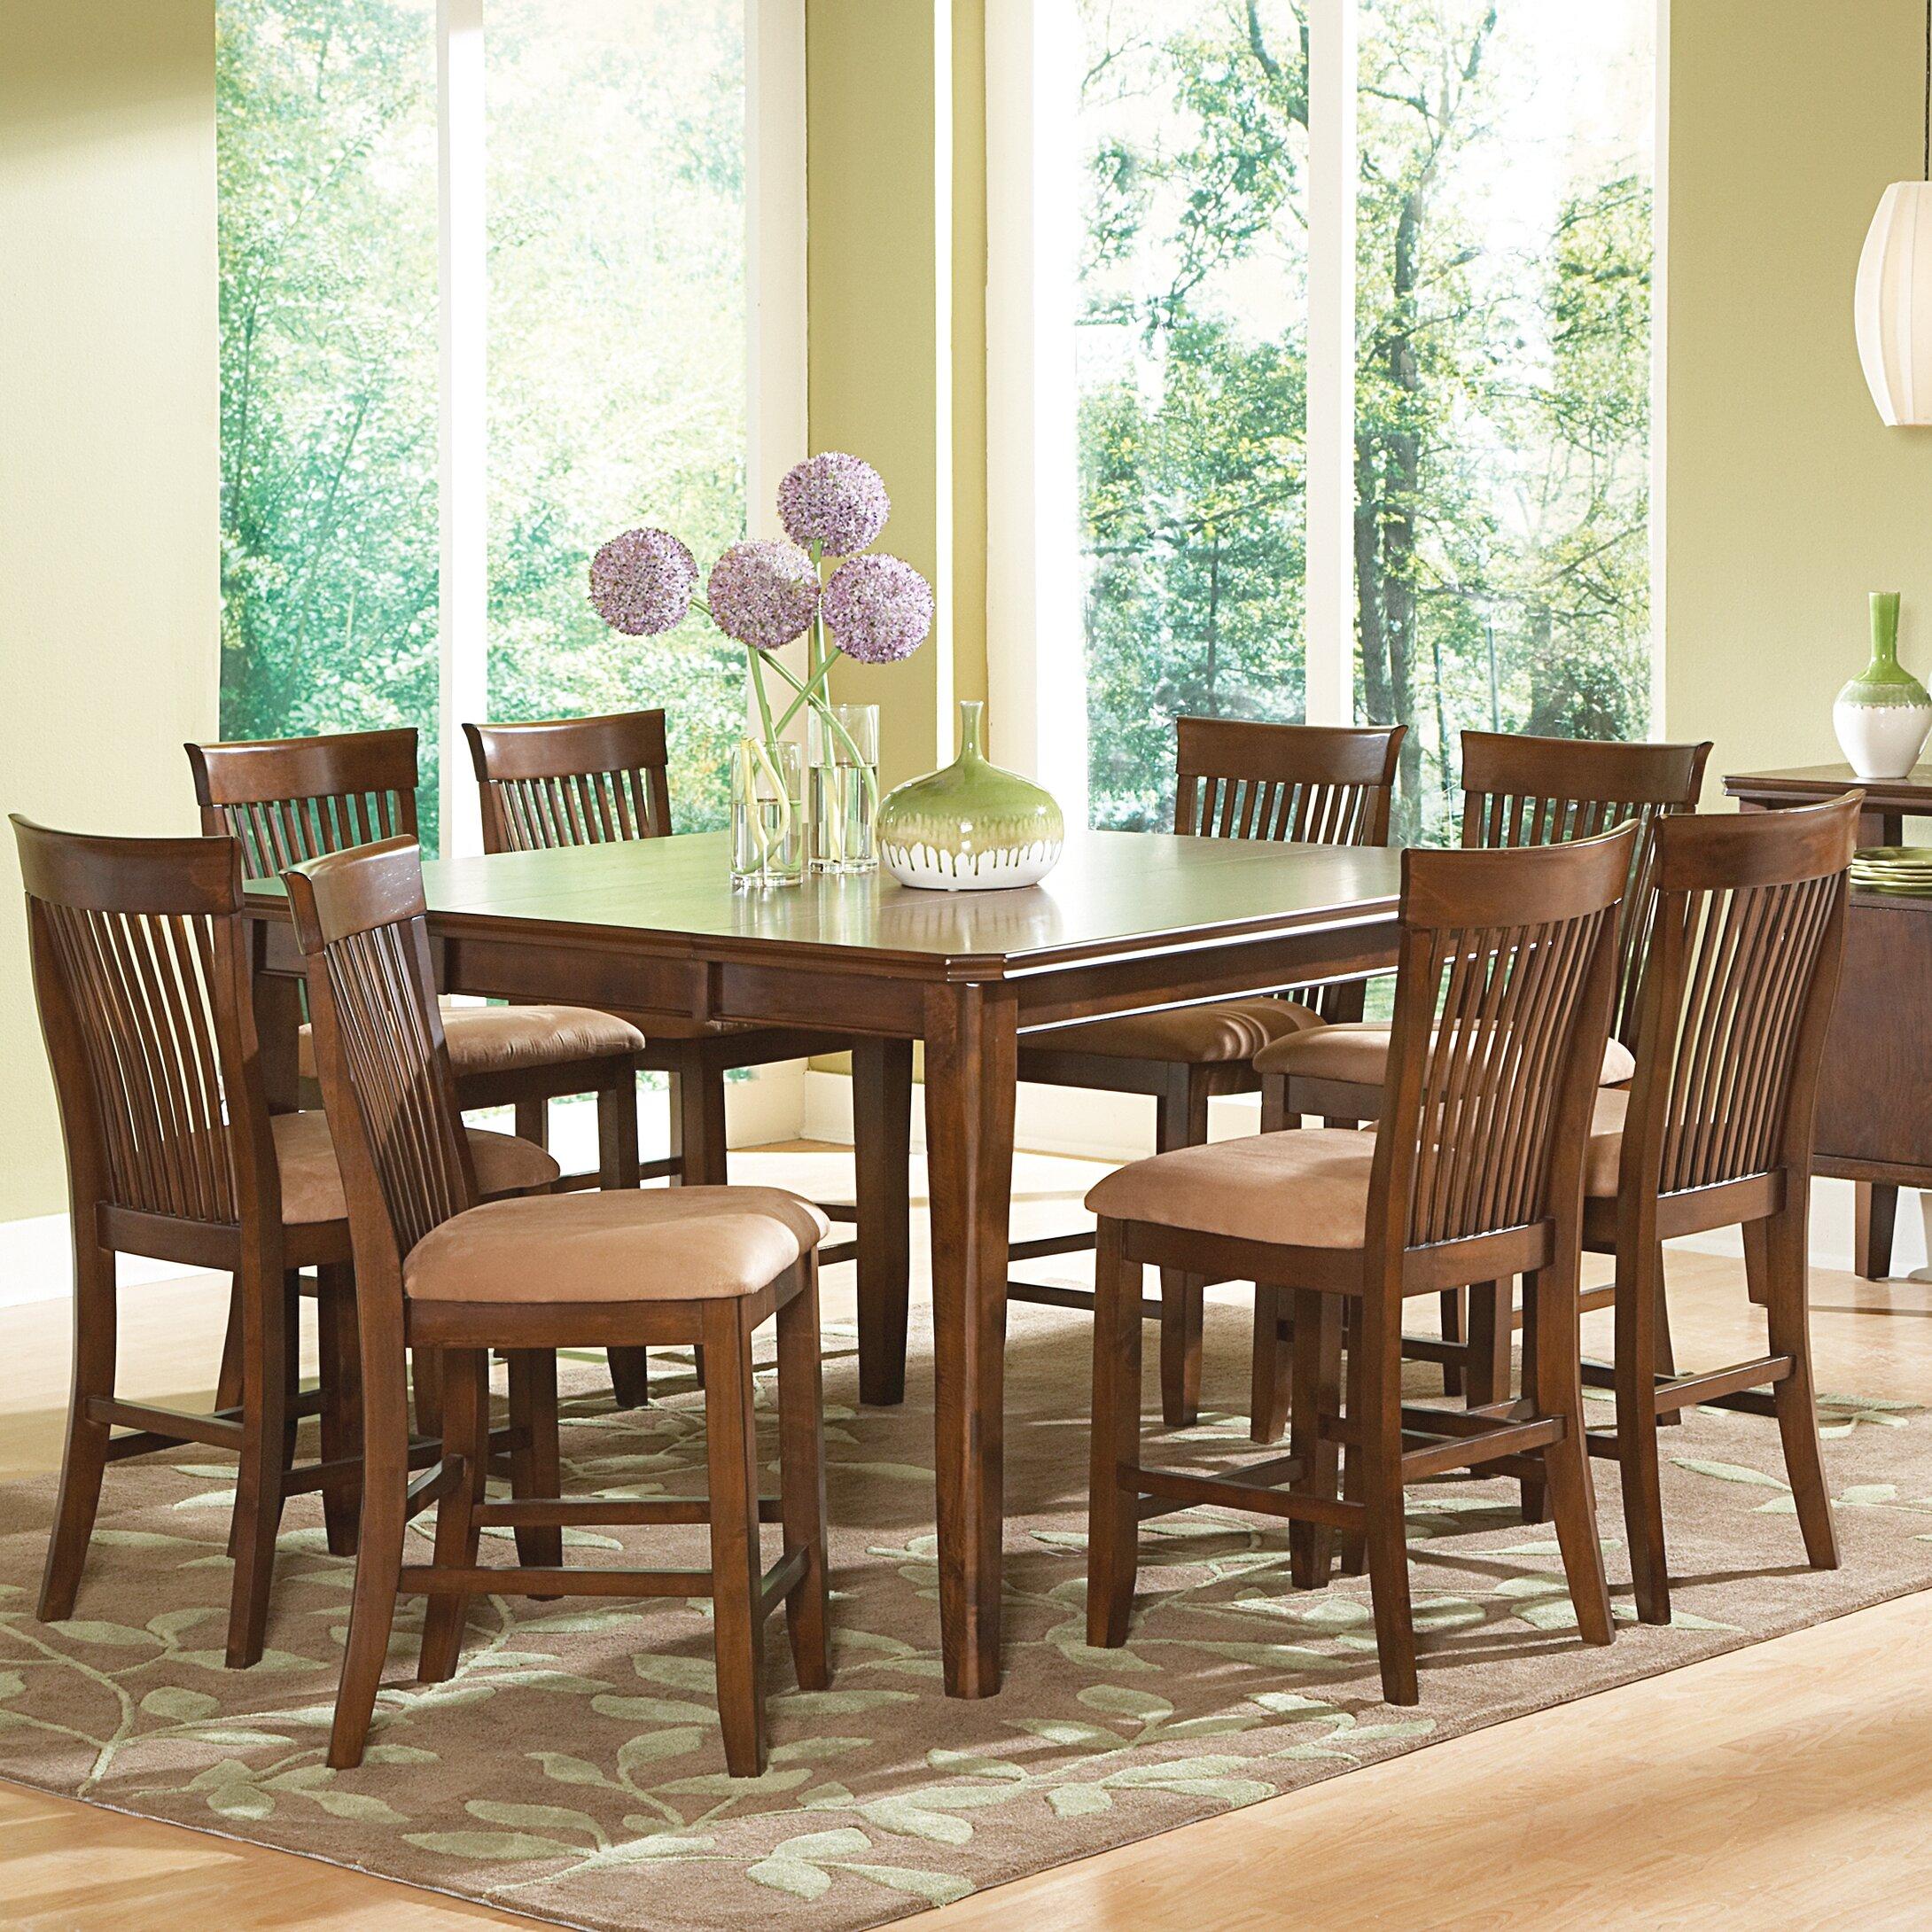 Red barrel studio johanson counter height extendable for Counter height extendable dining table